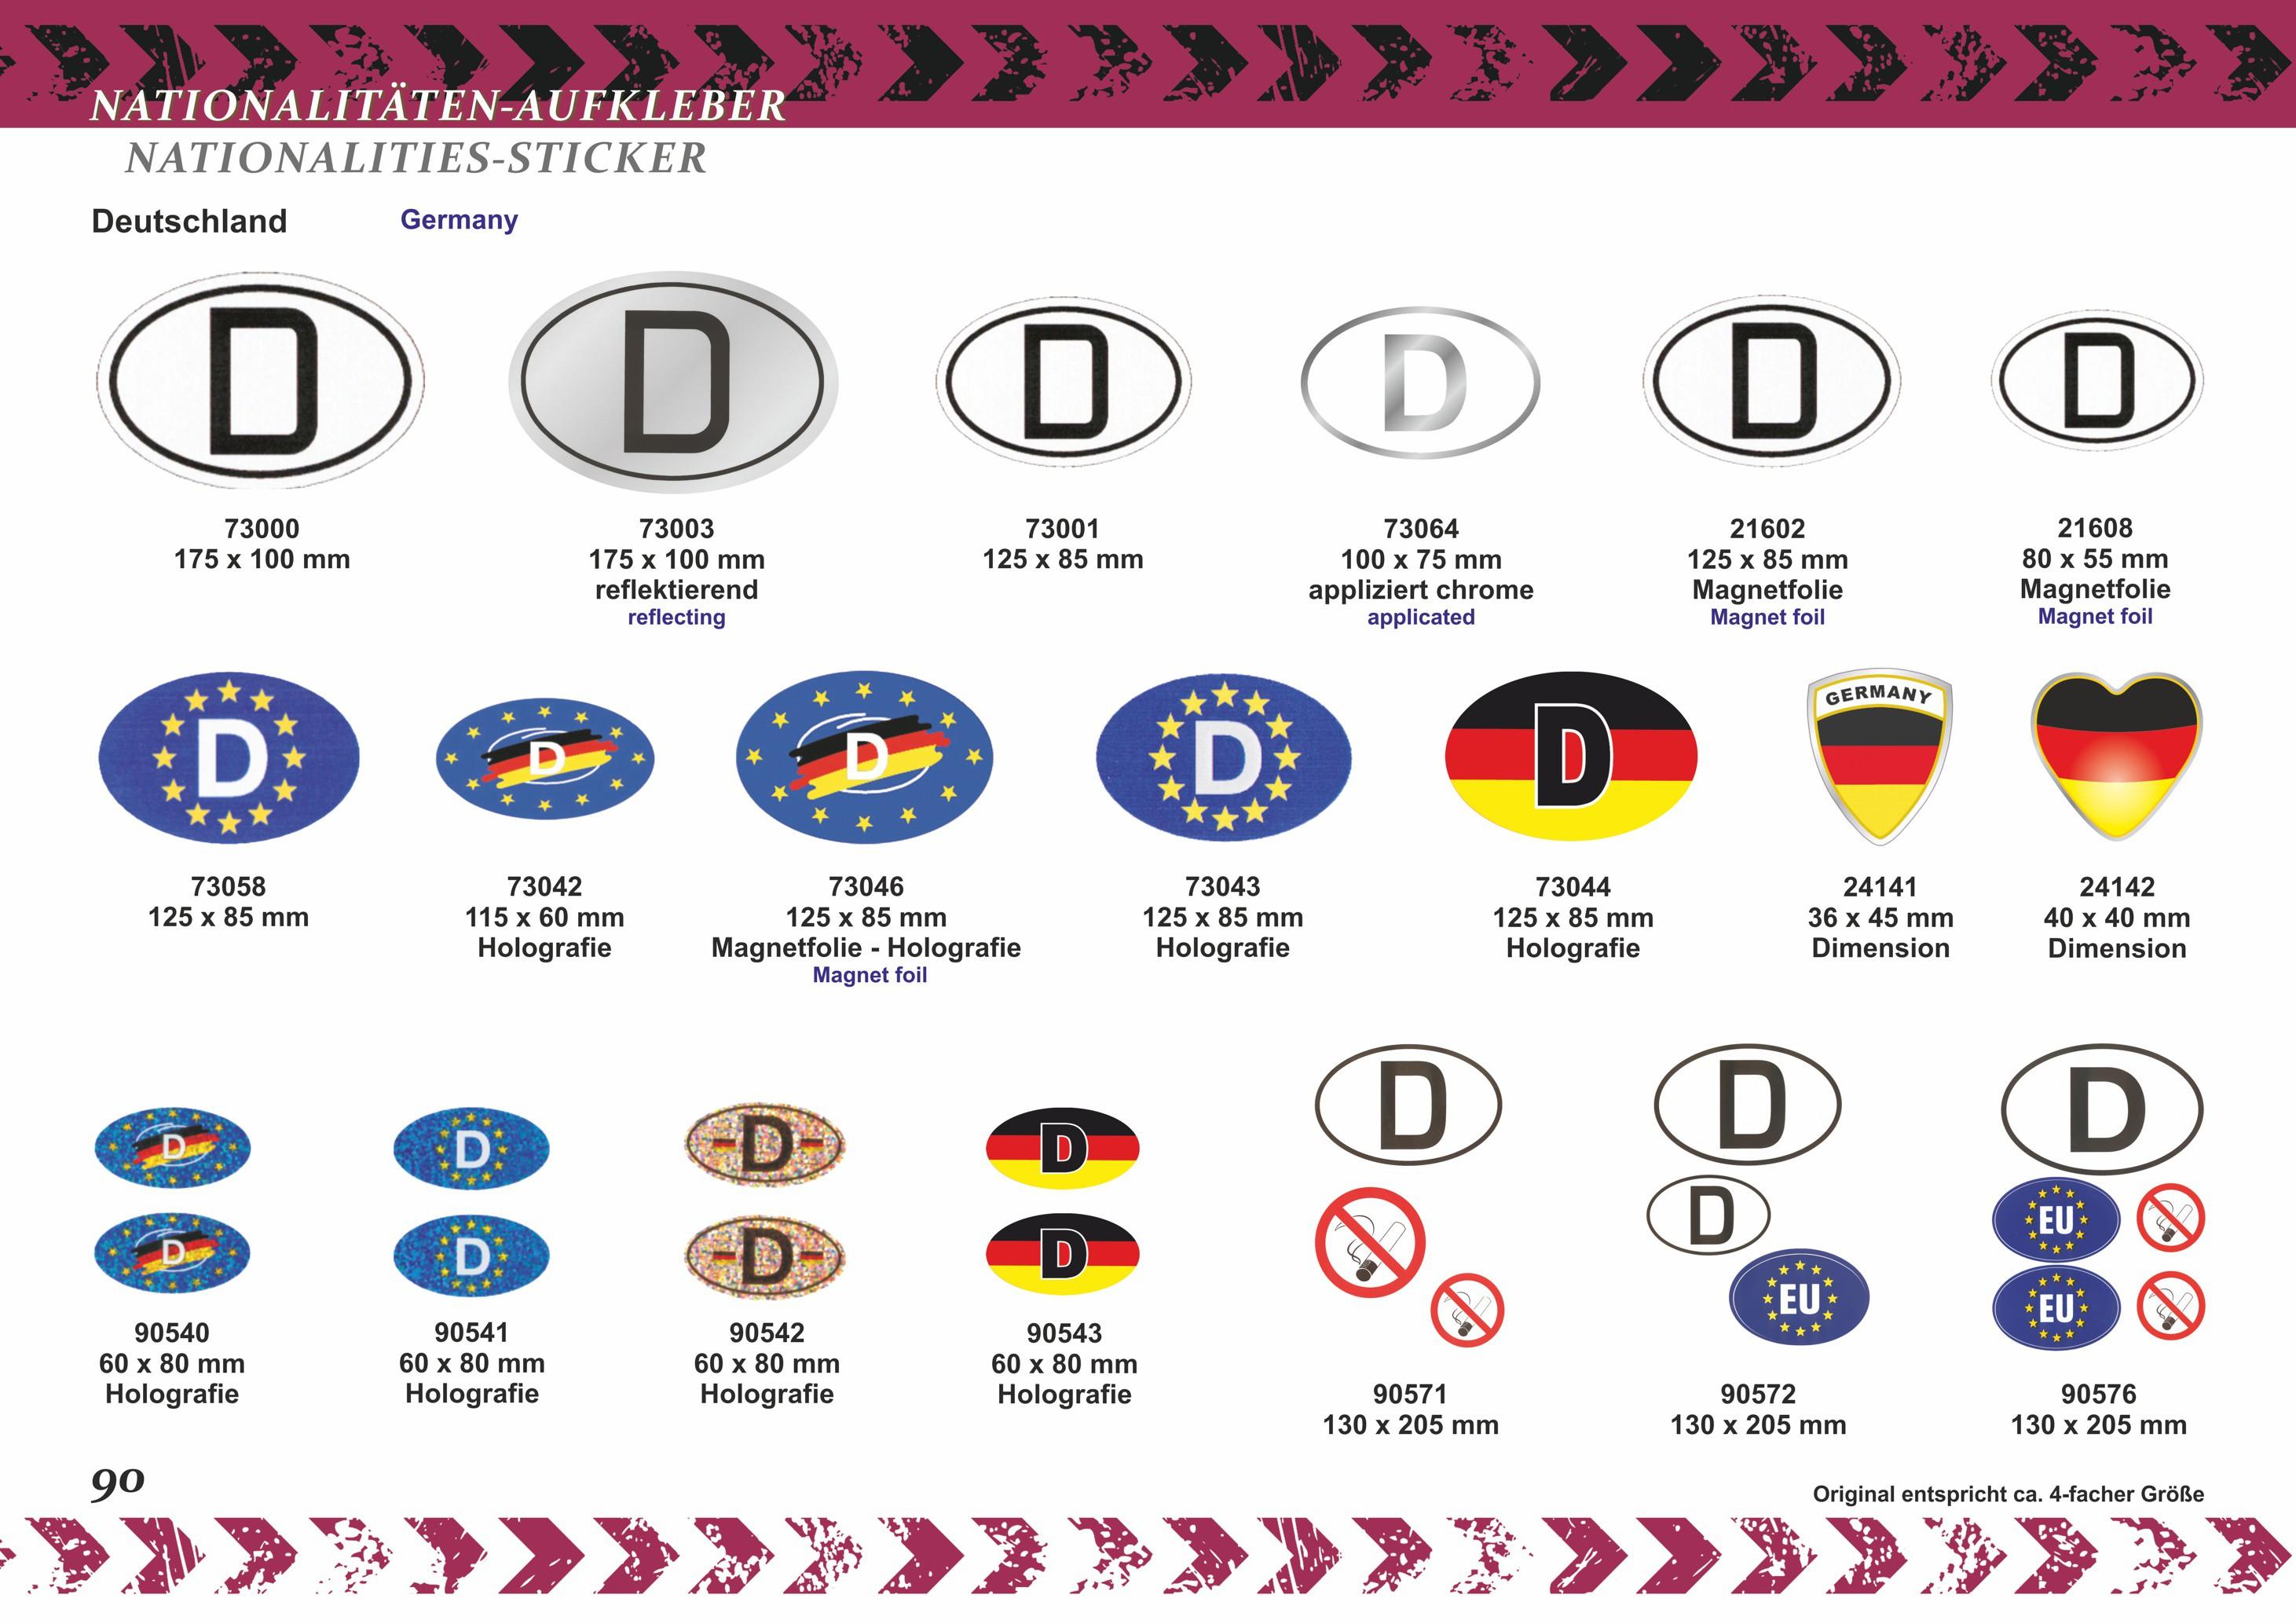 Autocollant Europe-D 125 x 85 mm – Bild 4